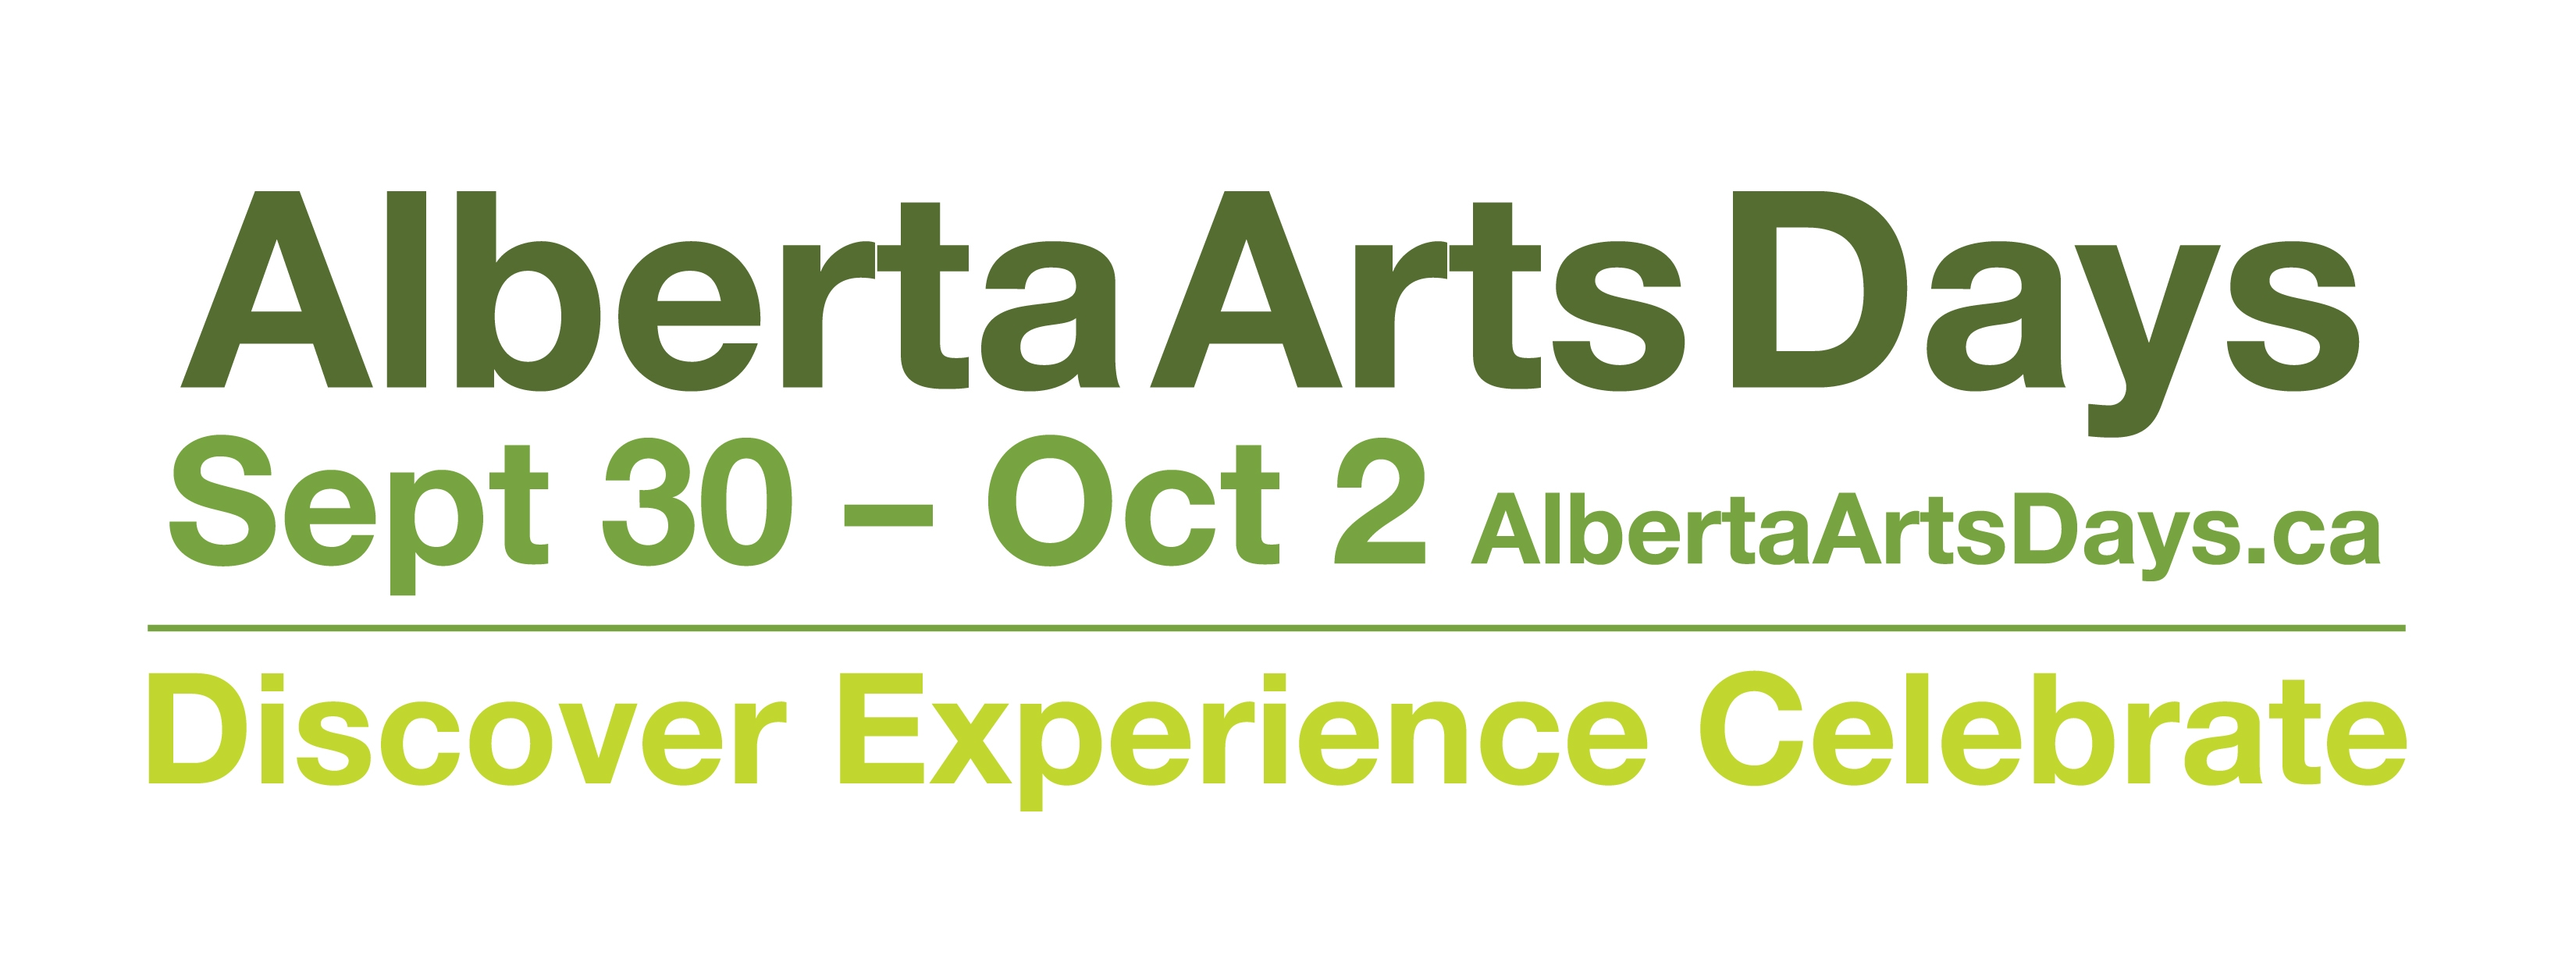 Alberta Arts Days 2011